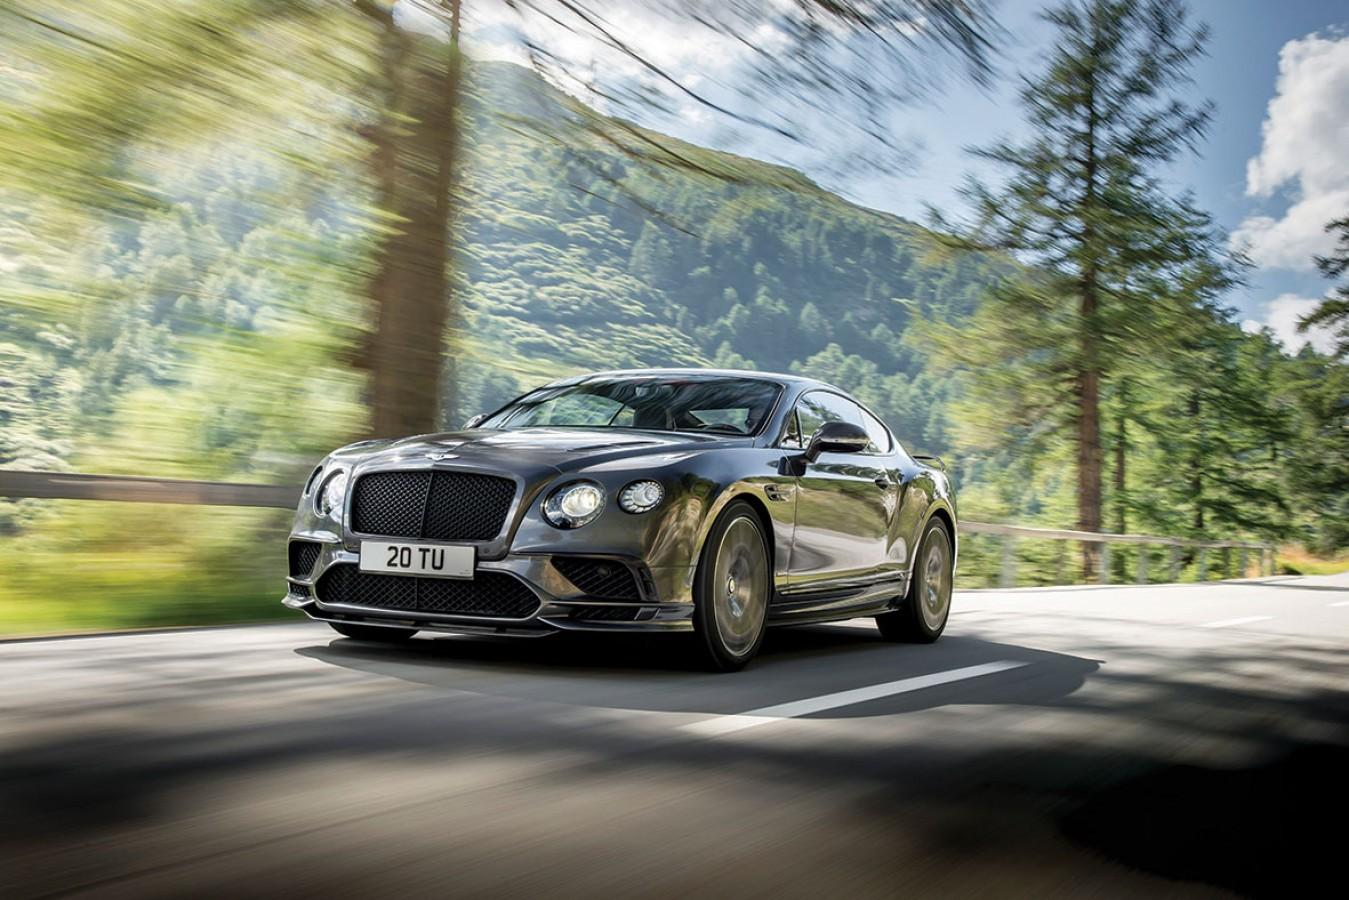 Fotomural Bentley Elegance A08-M918 Fotomural Bentley Elegance A08-M918